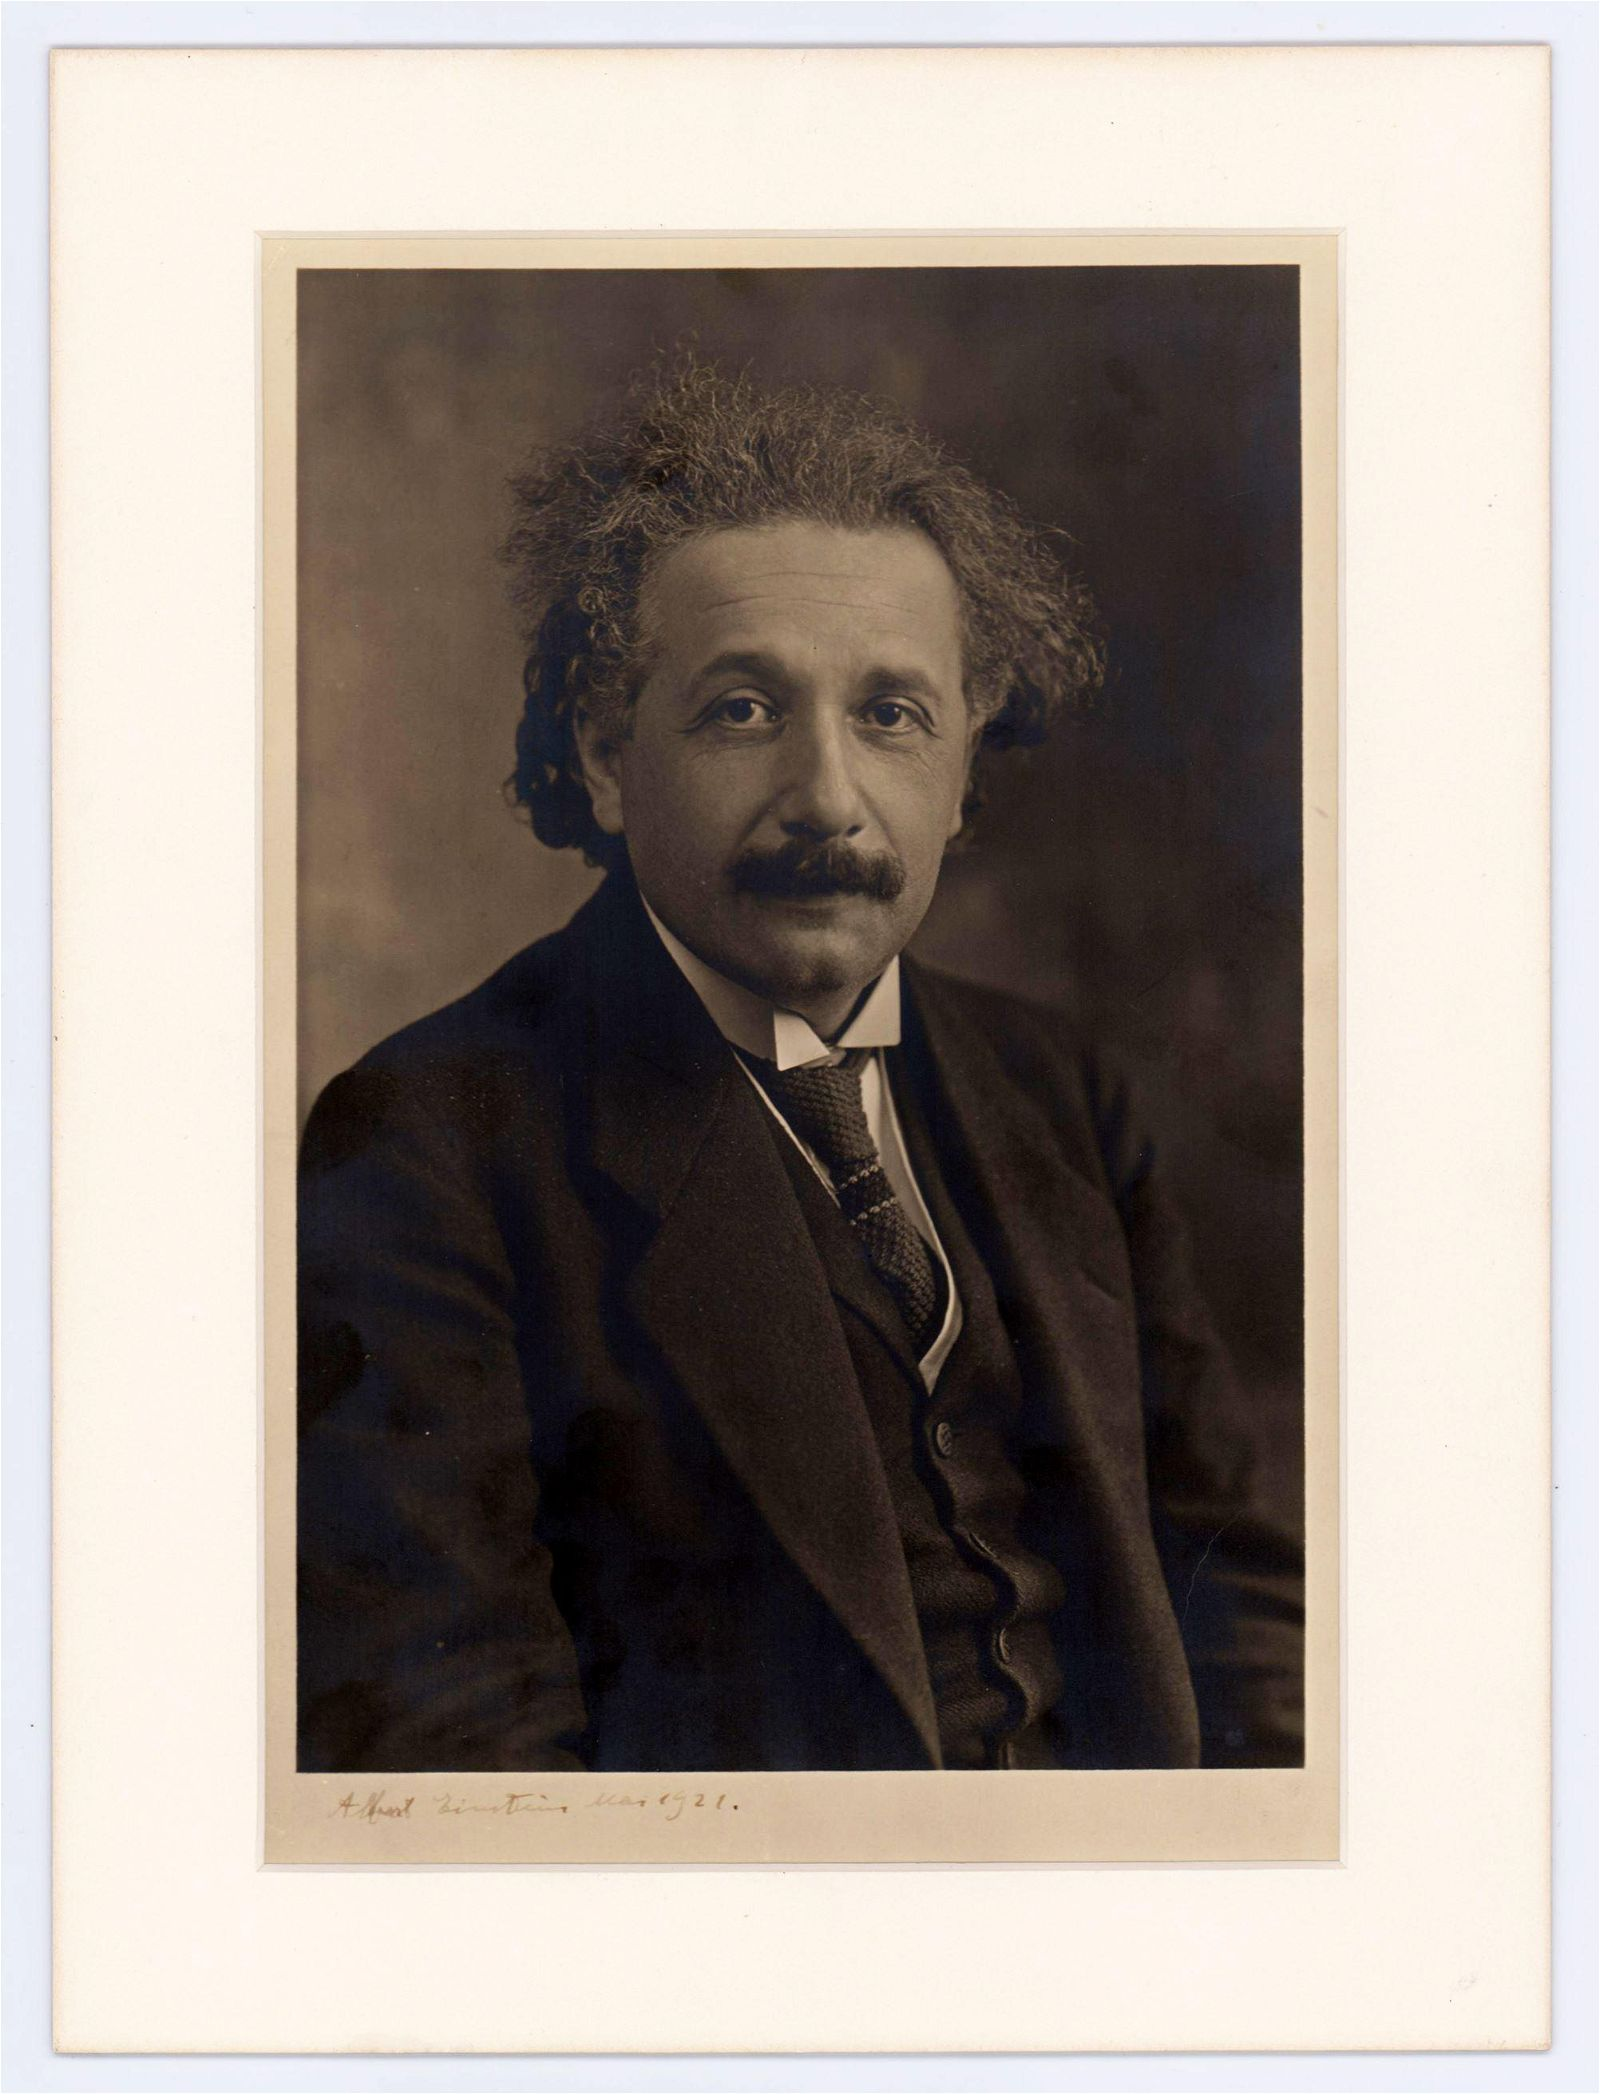 Albert Einstein Exceptional Signed Photo Dating from